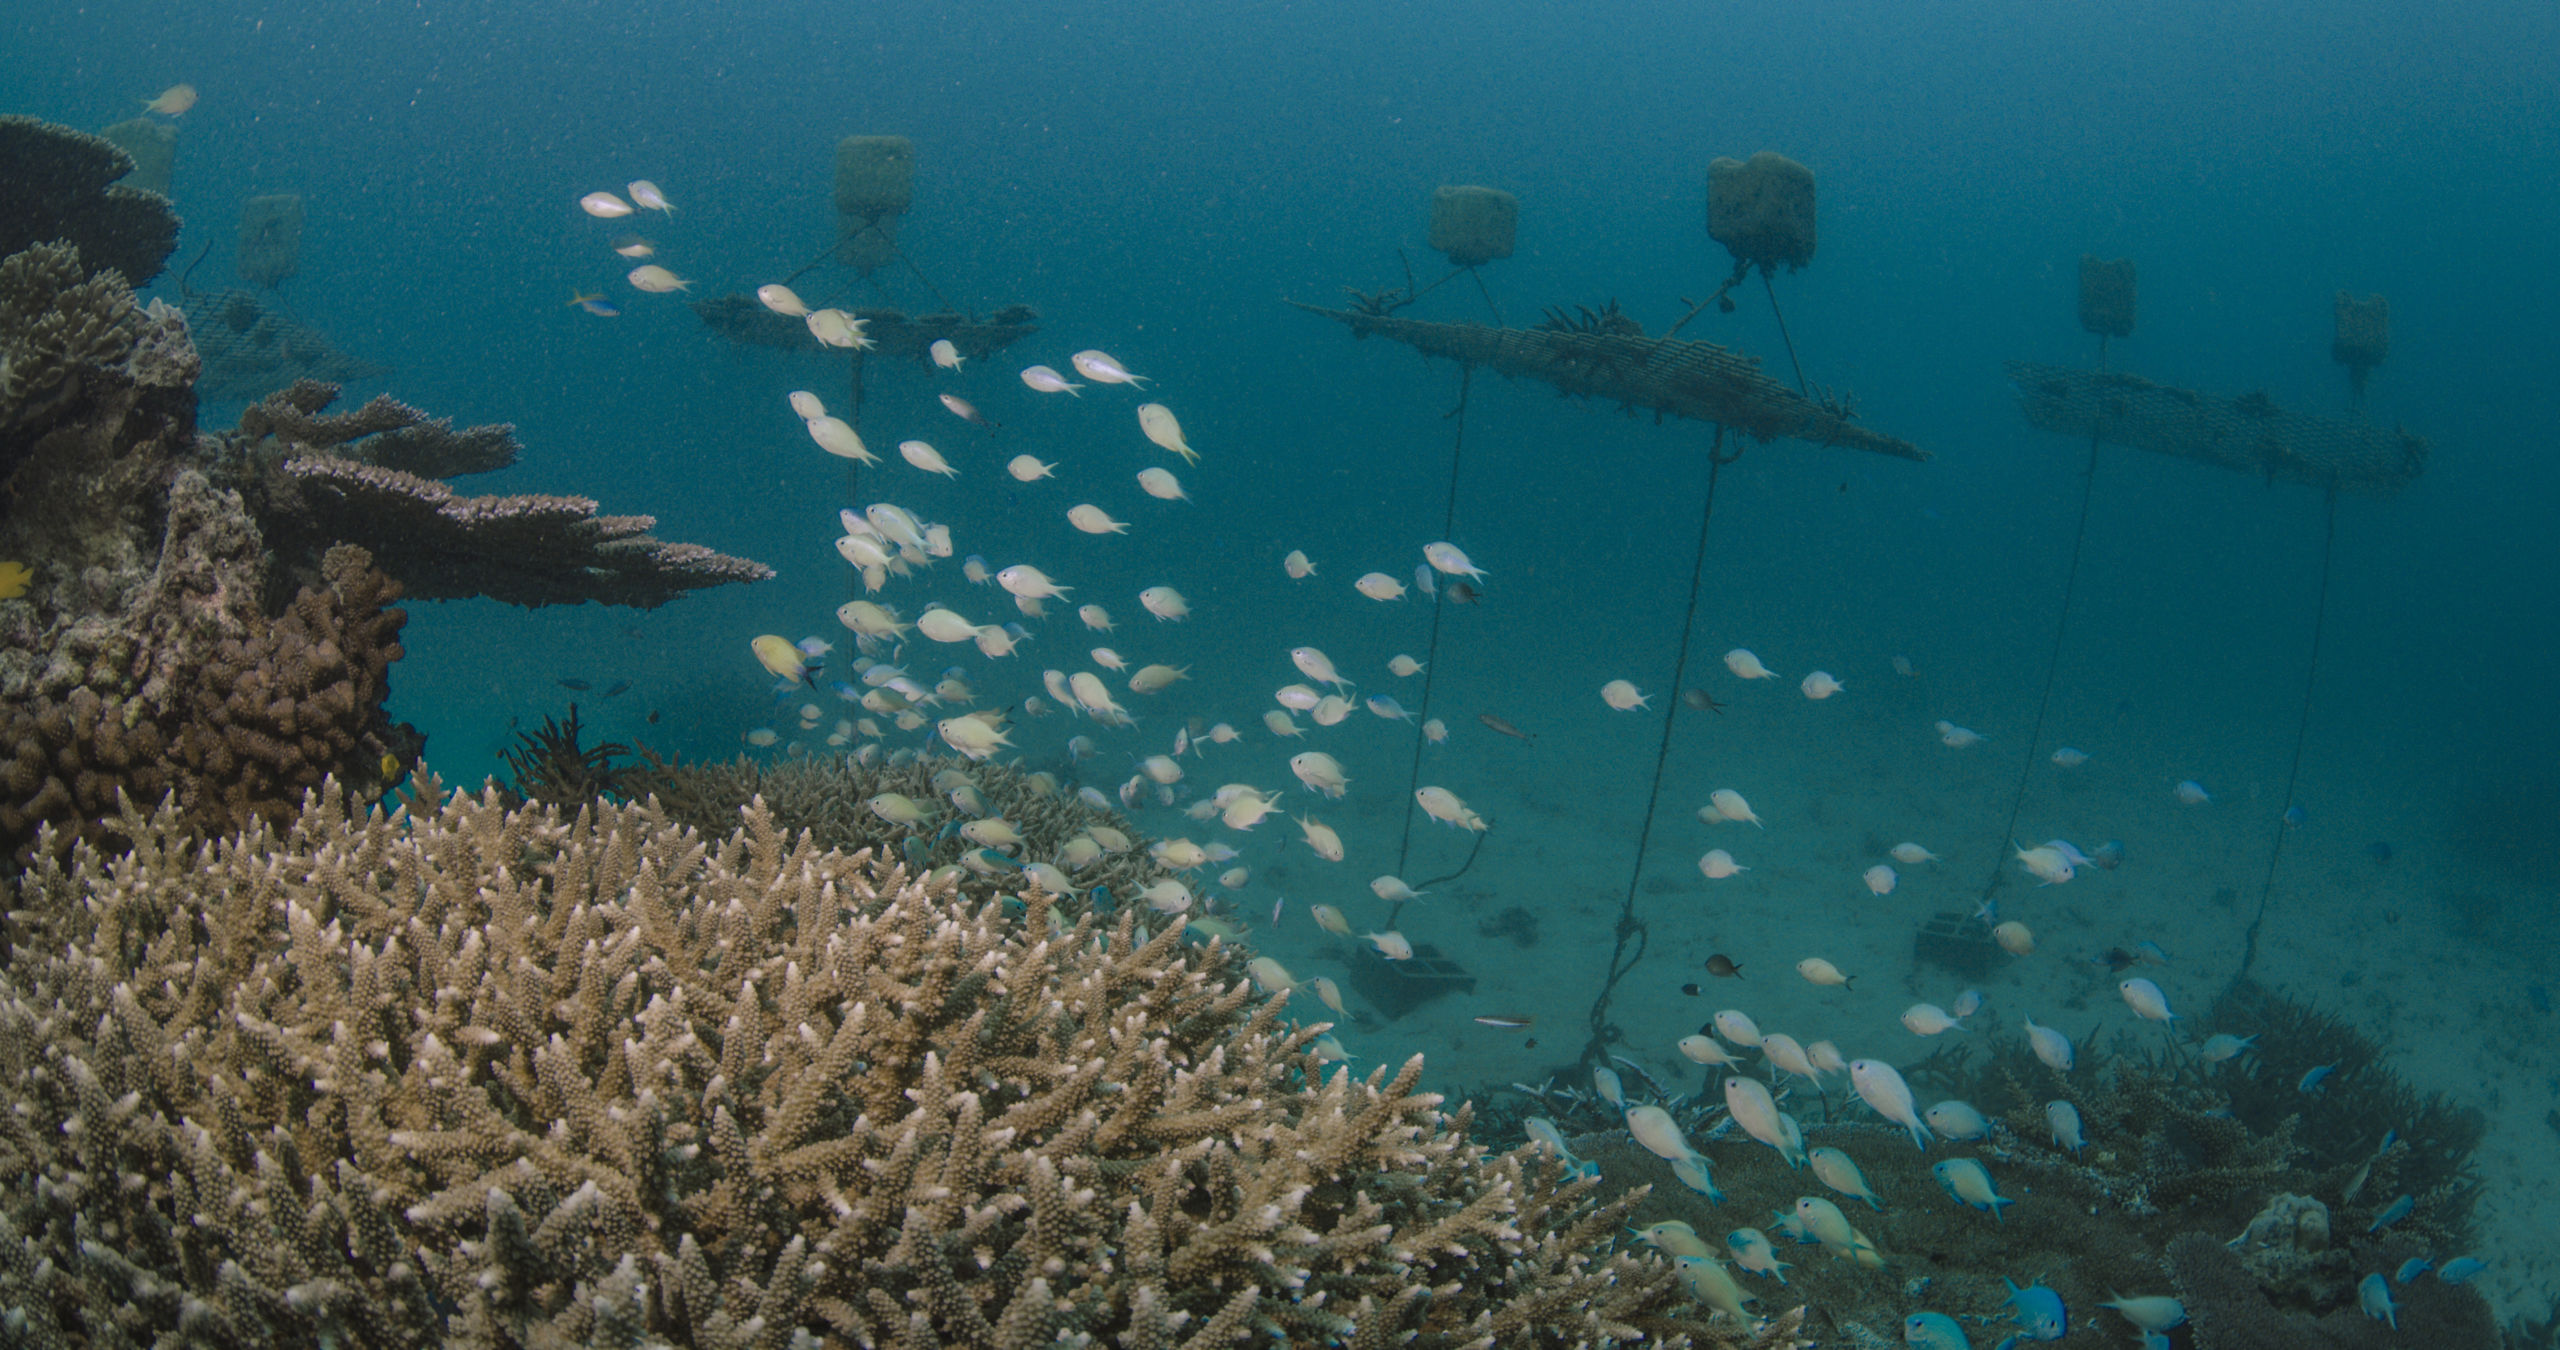 Coral nurseries. Credit: Great Barrier Reef Foundation